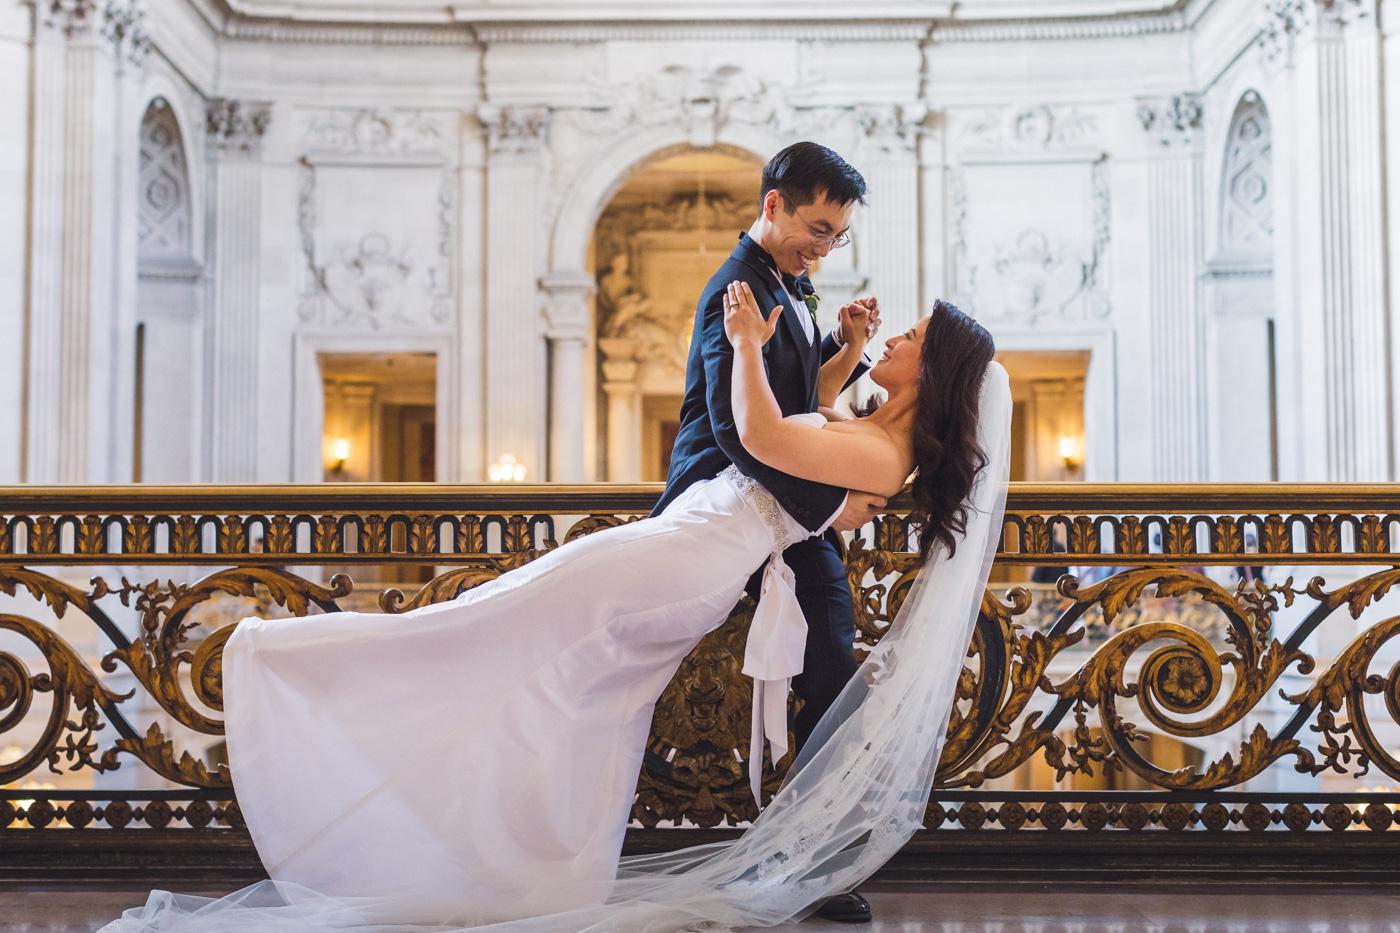 aaron-kes-photography-san-francisco-city-hall-wedding-33.jpg